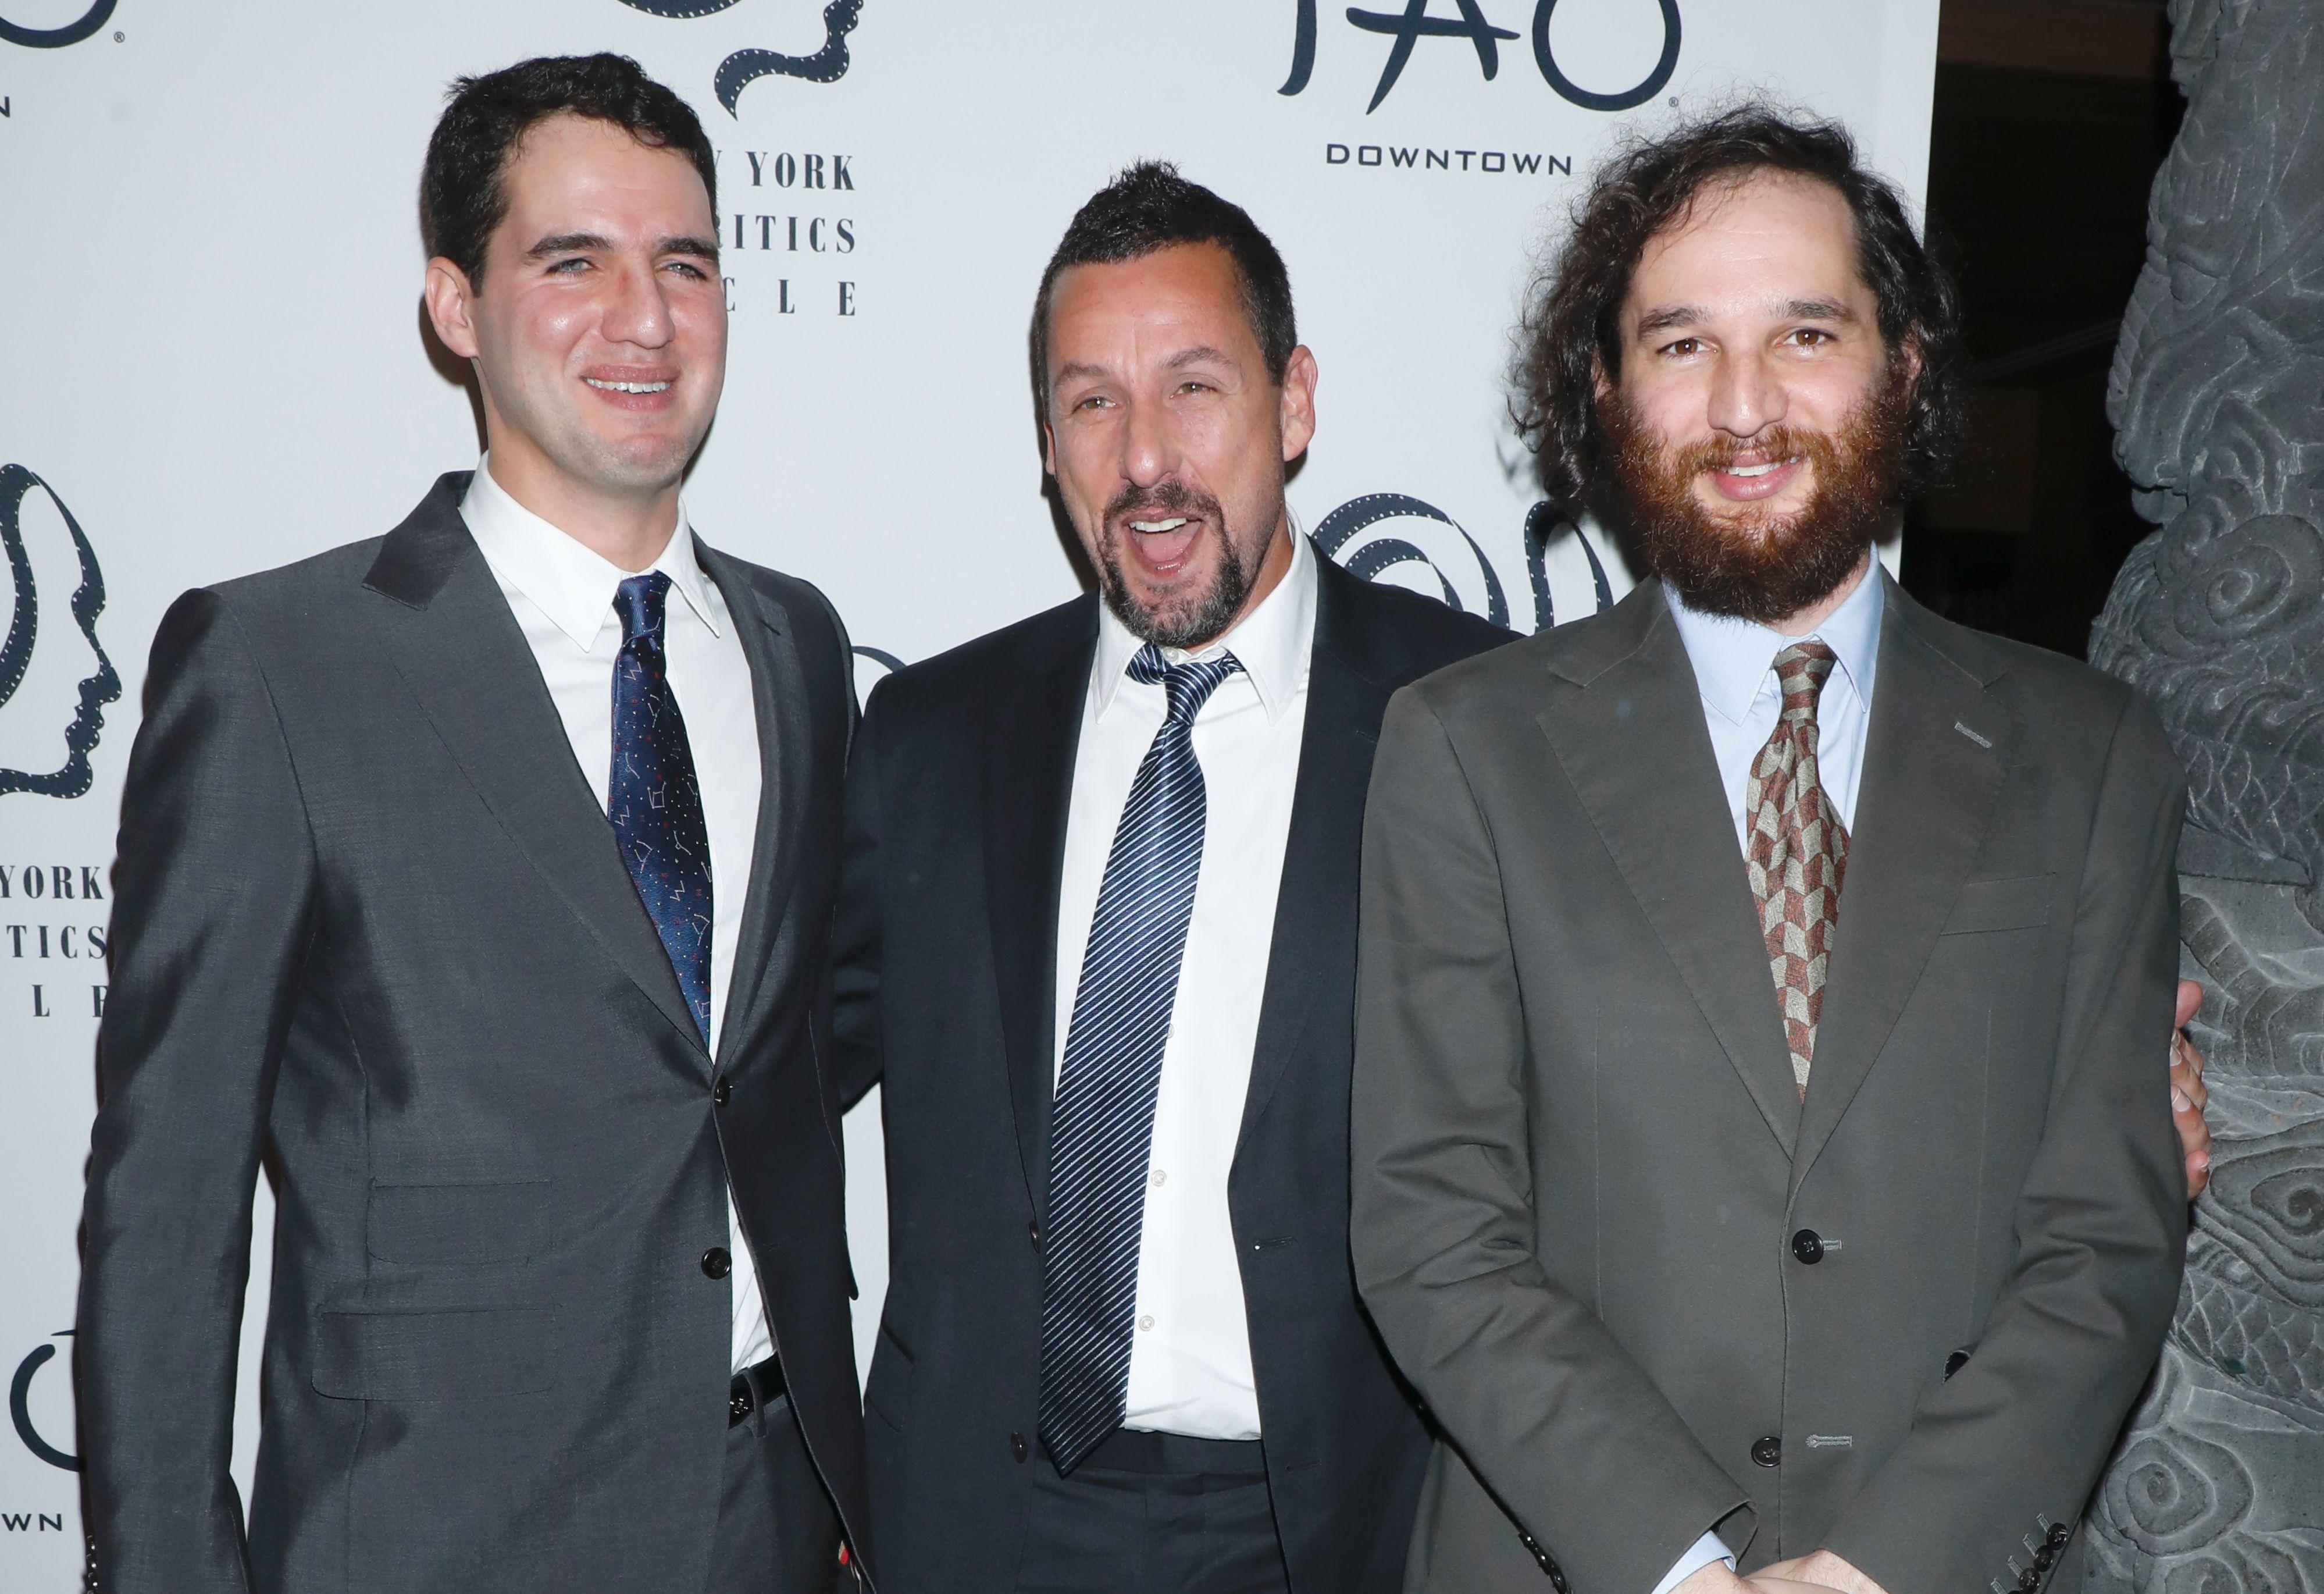 Adam Sandler Roasts the Safdies, Calls Film Critics Mean in Uproarious NYFCC Speech